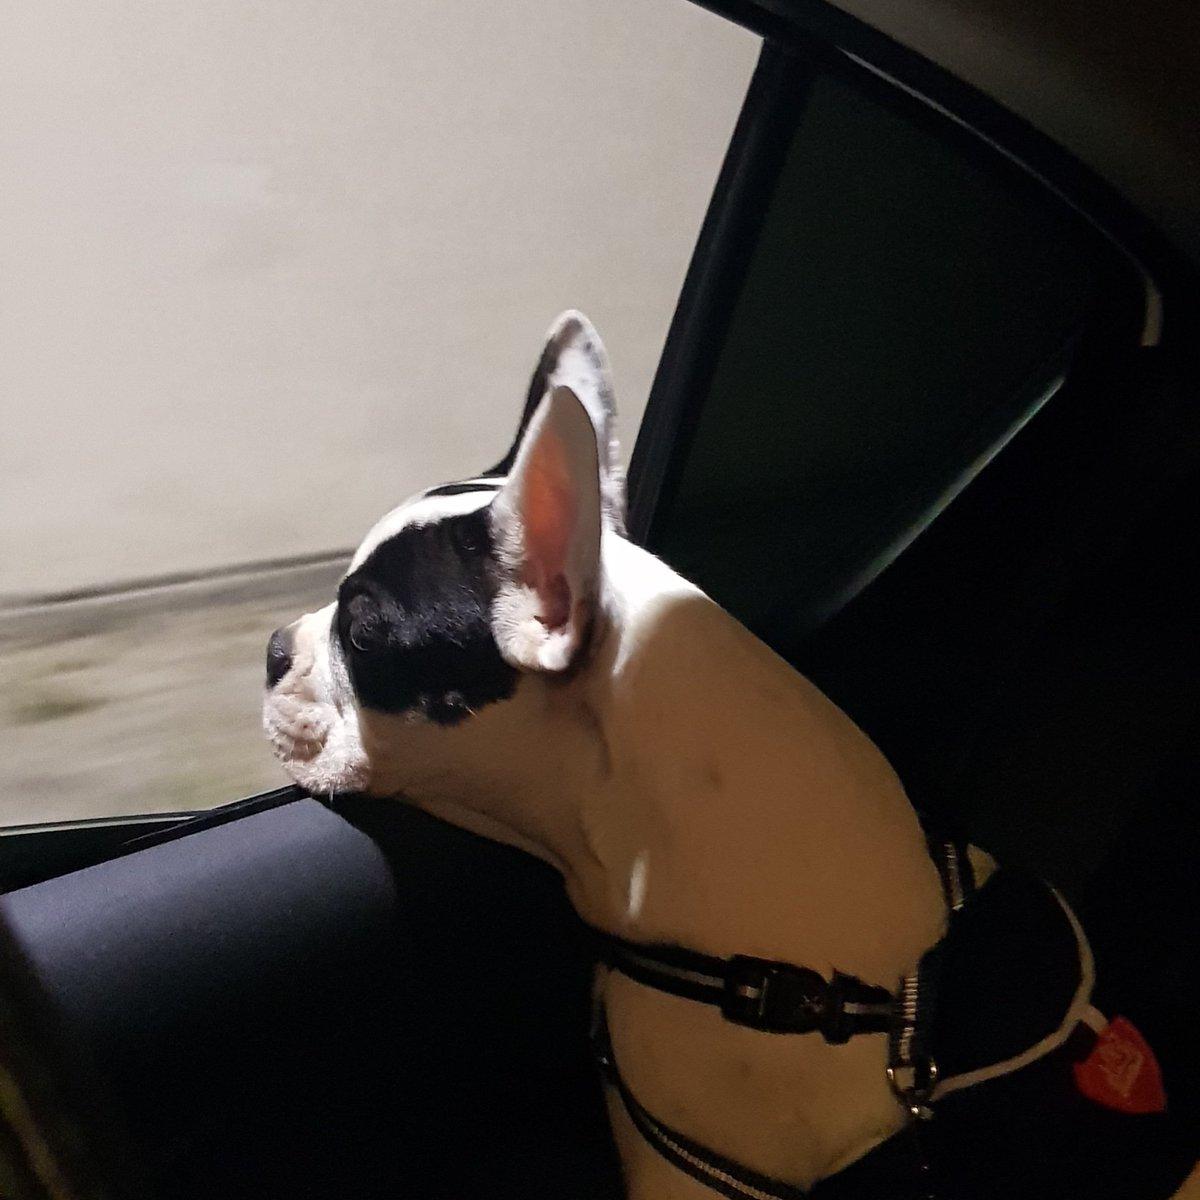 Meu decente já pode passear #Oliver #oliverdog #bulldogs #bulldogfrancês pic.twitter.com/Cz4QRYr3iz